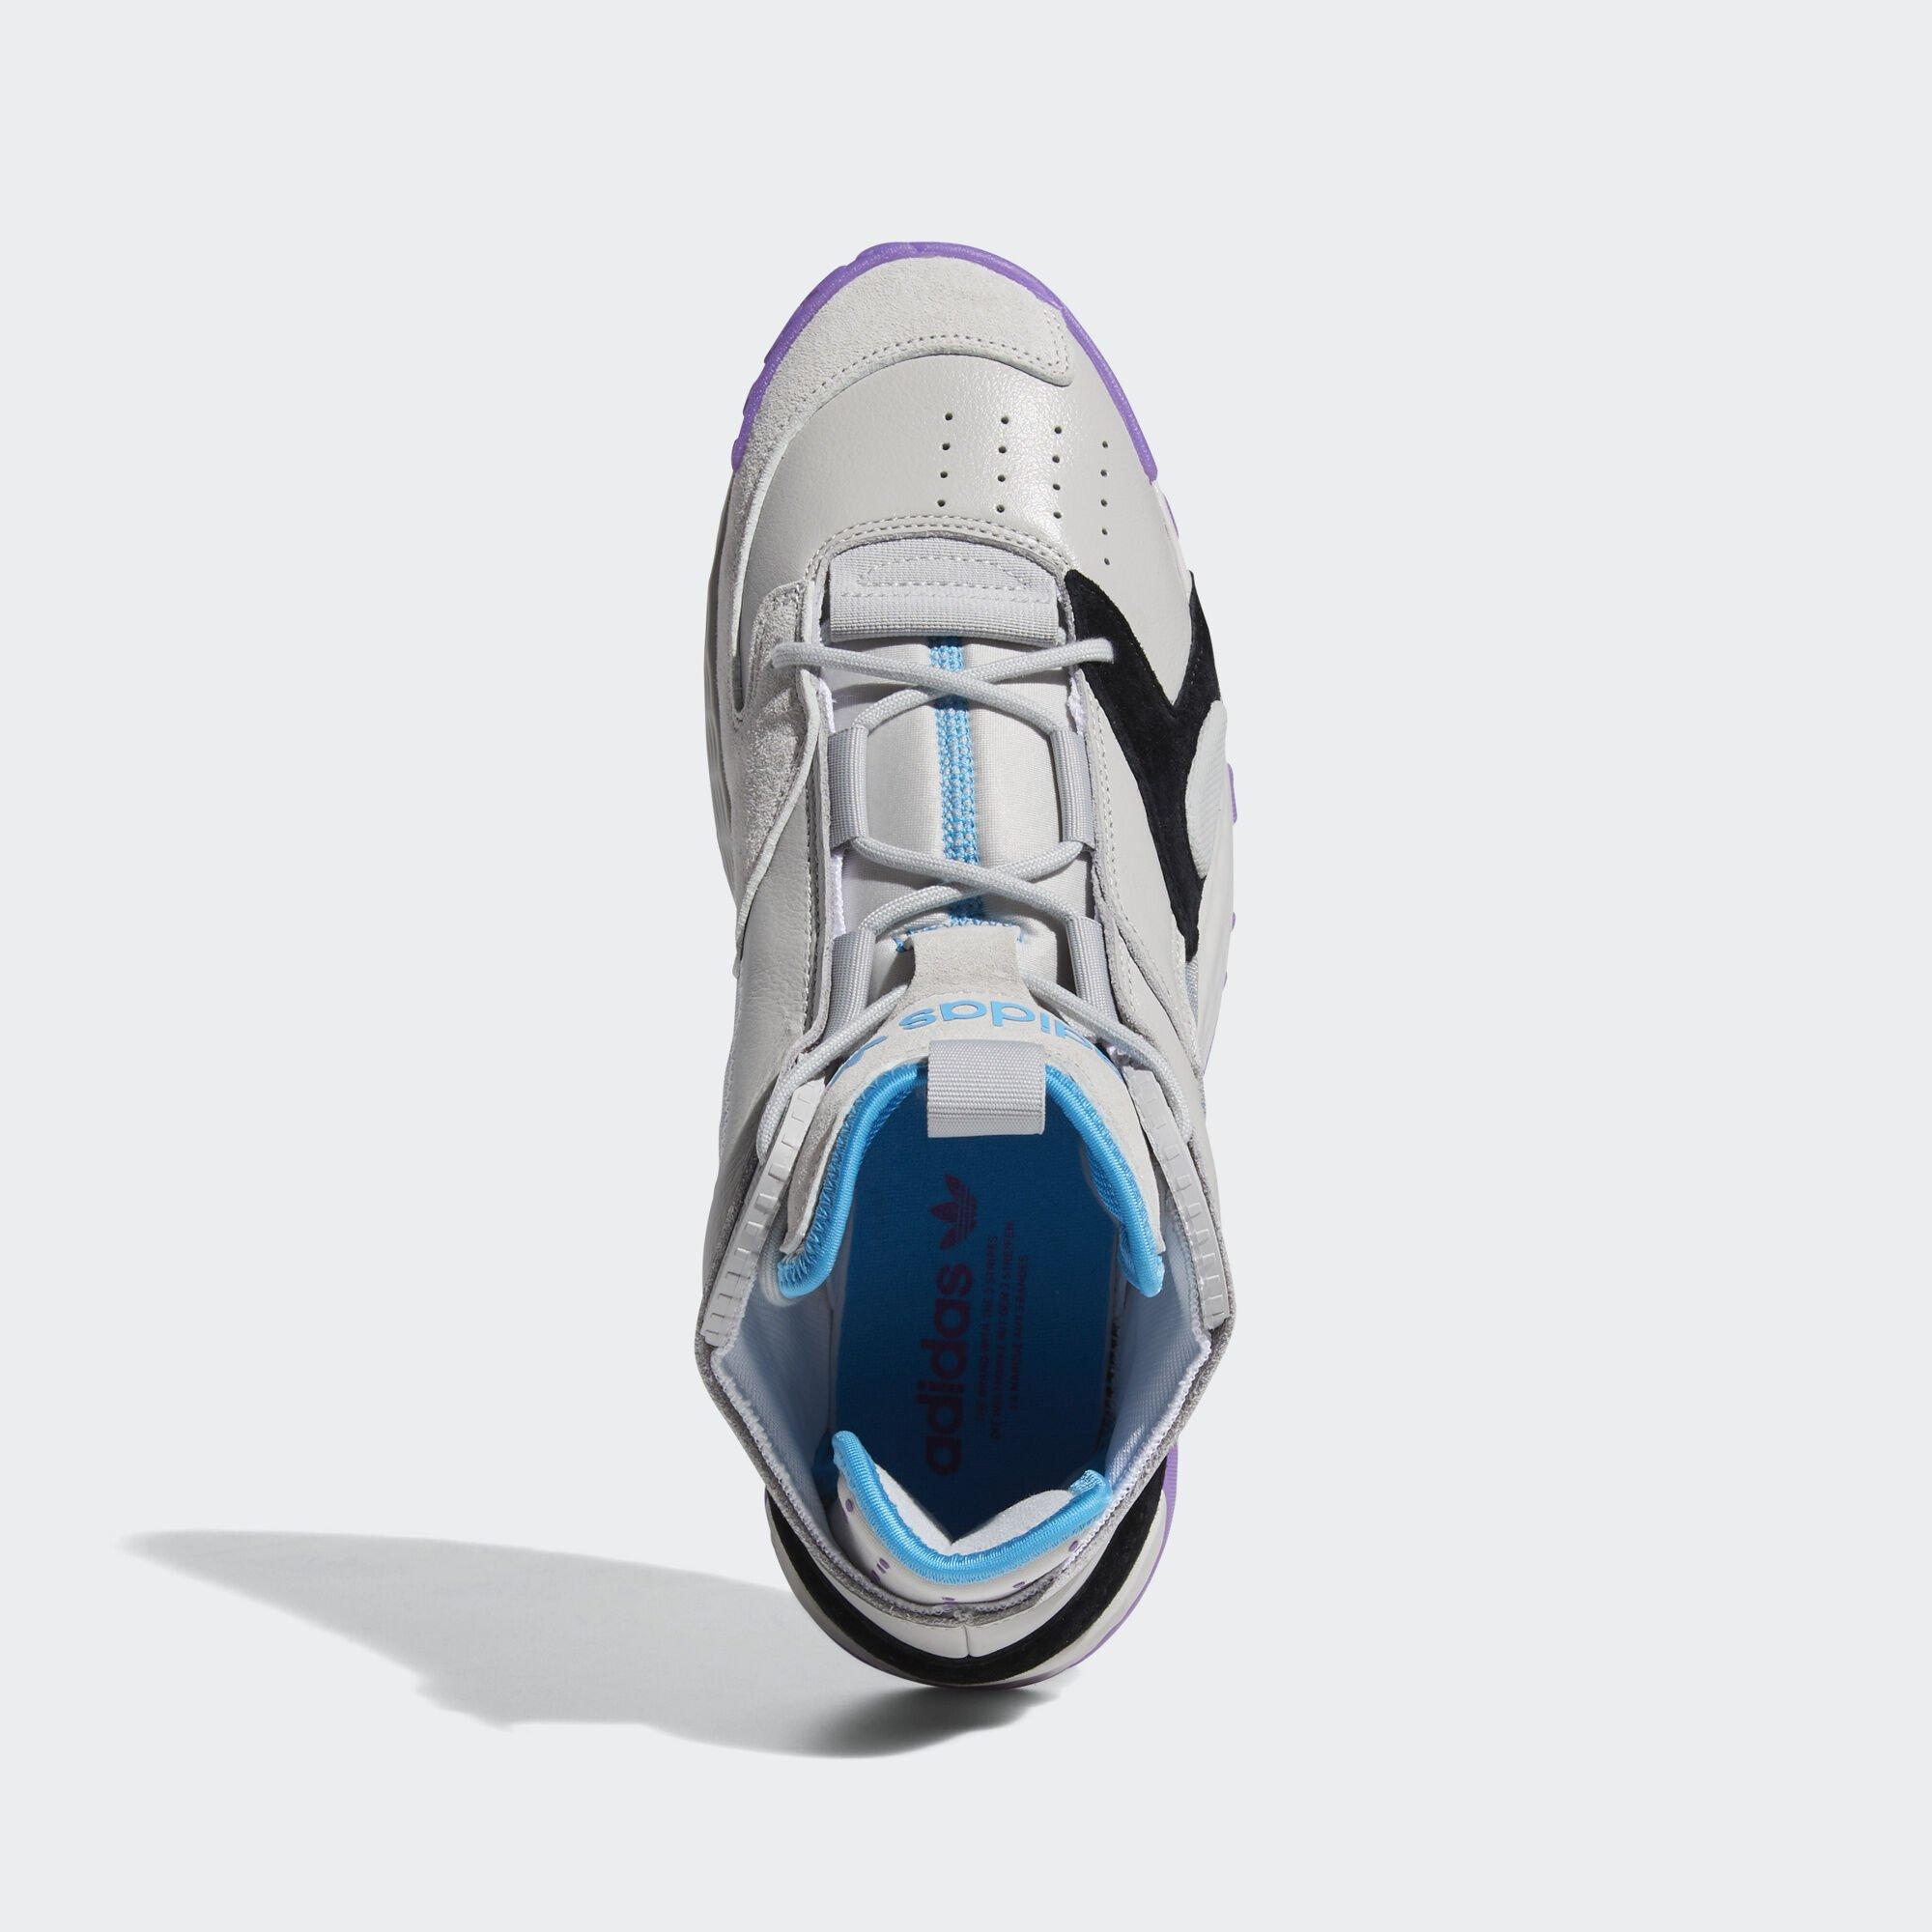 adidas,Street,发售 四色齐发!搭载全新缓震的 adidas StreetBall 系列即将来袭!